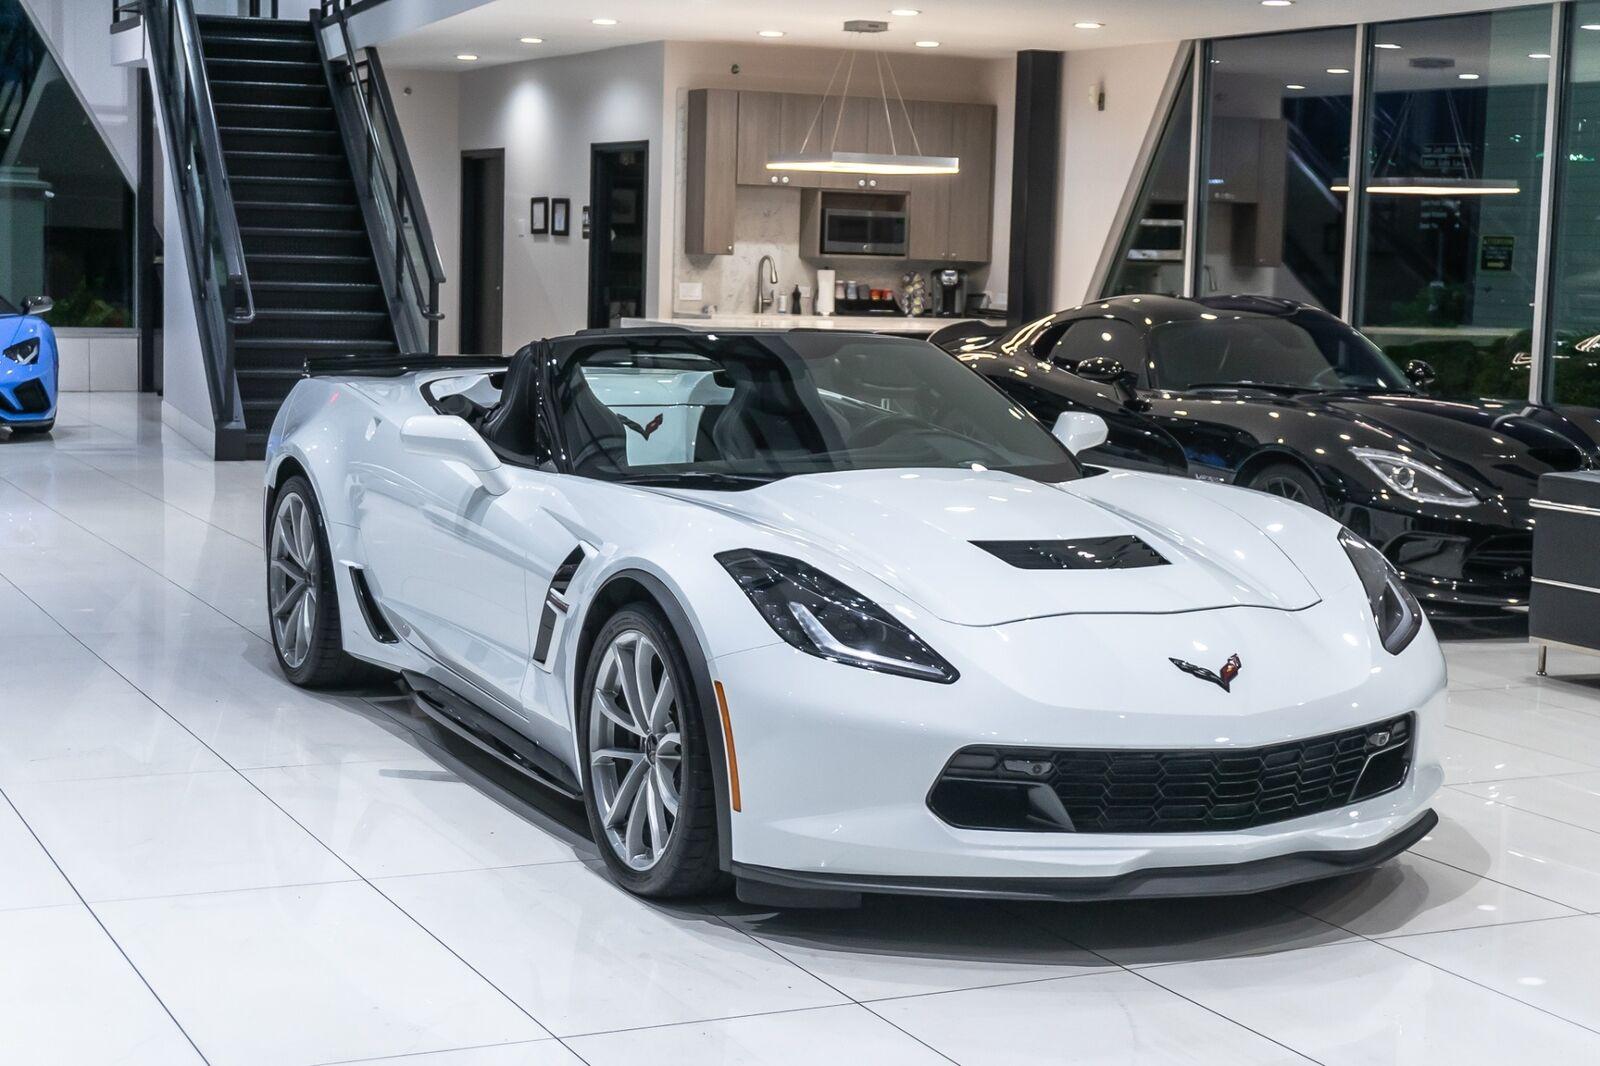 2019 White Chevrolet Corvette Convertible 2LT | C7 Corvette Photo 8